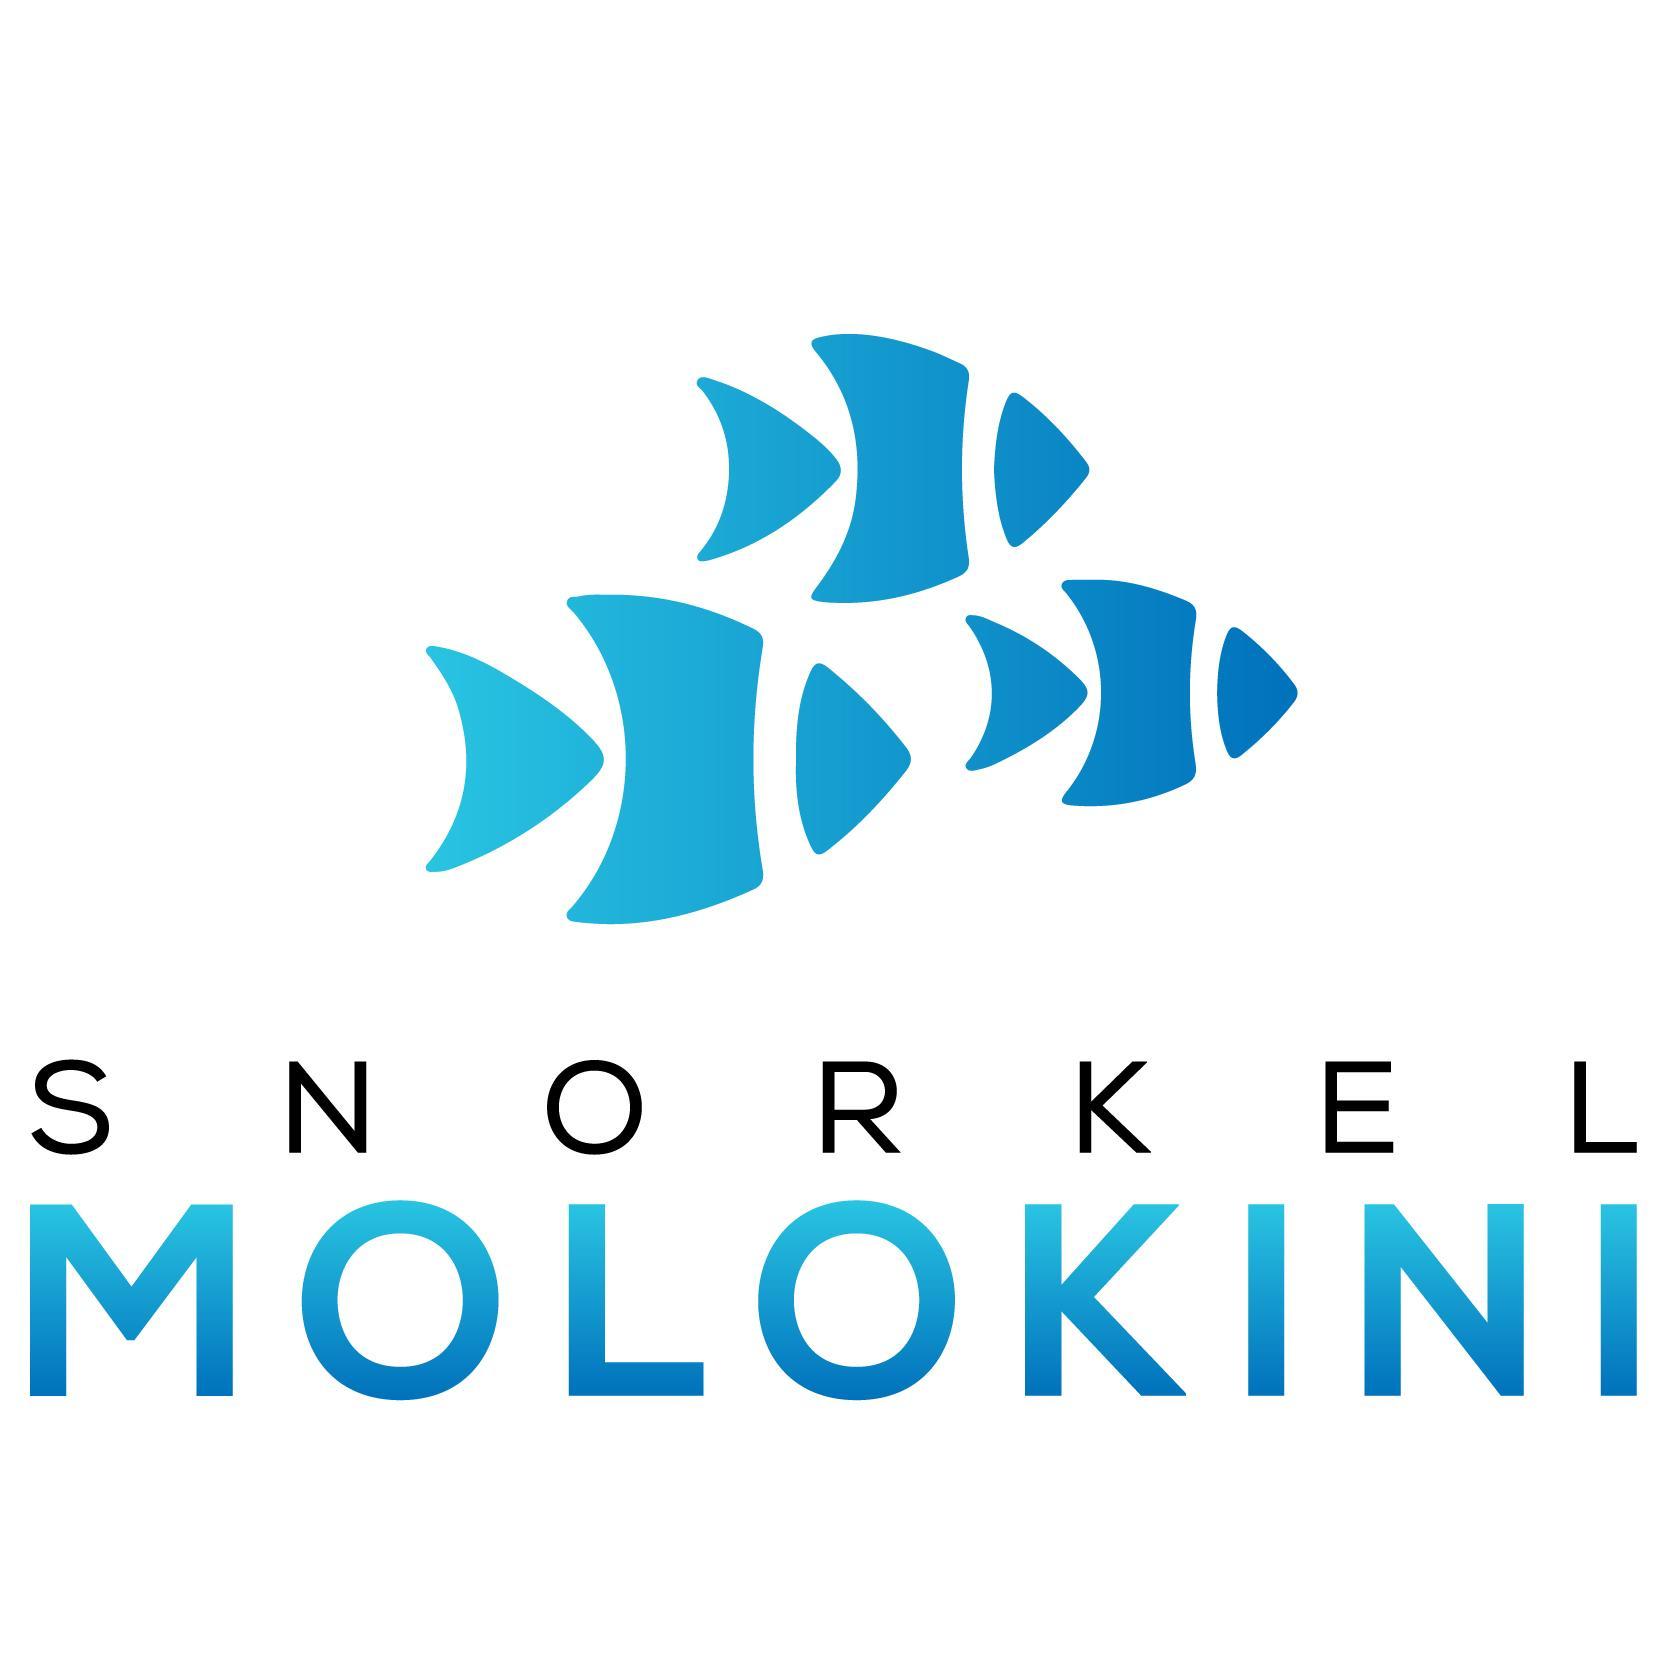 Snorkel Molokini logo